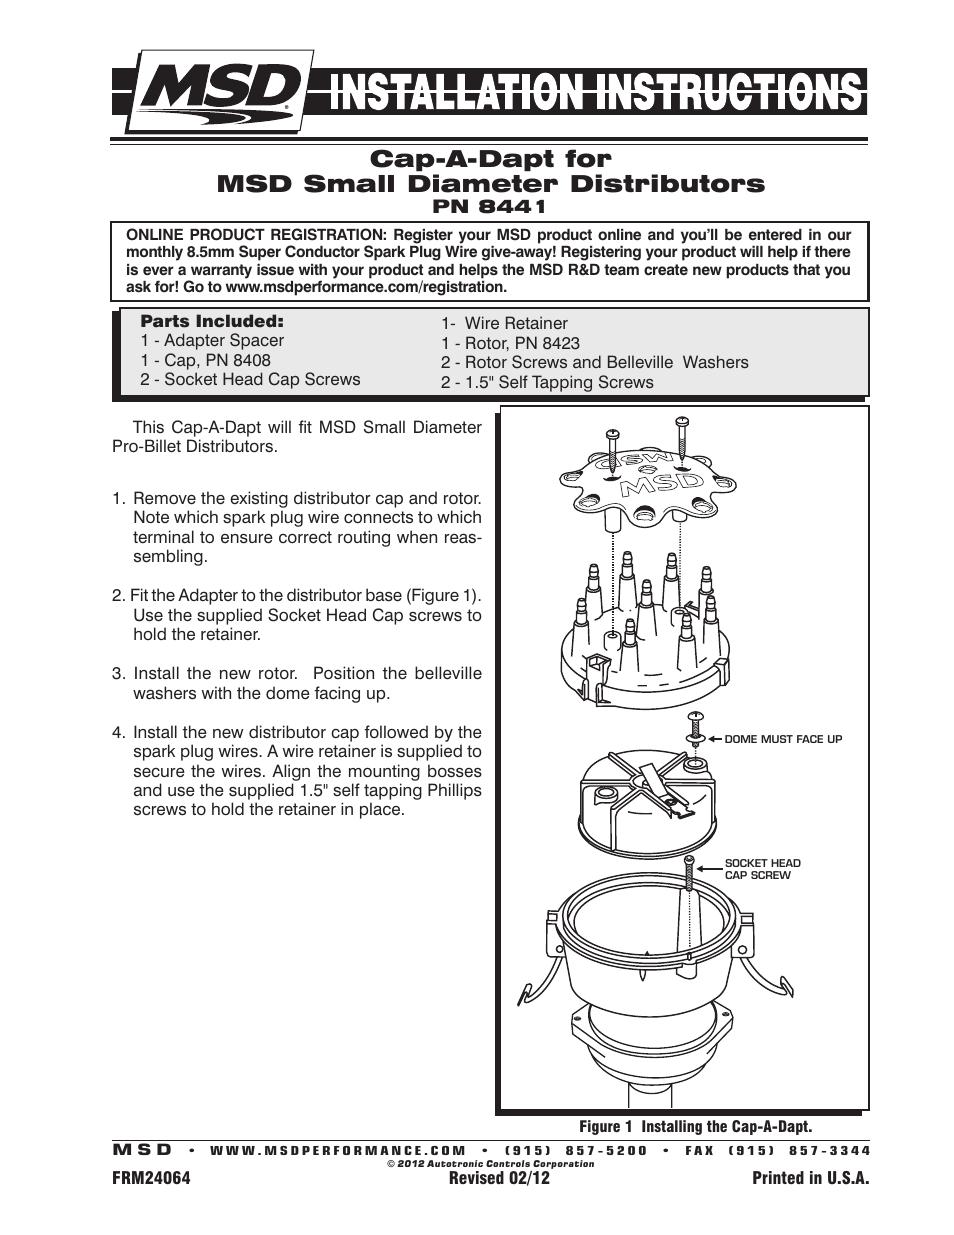 MSD 8441 Cap-A-Dapt for Small Diameter MSD Distributors Installation ...